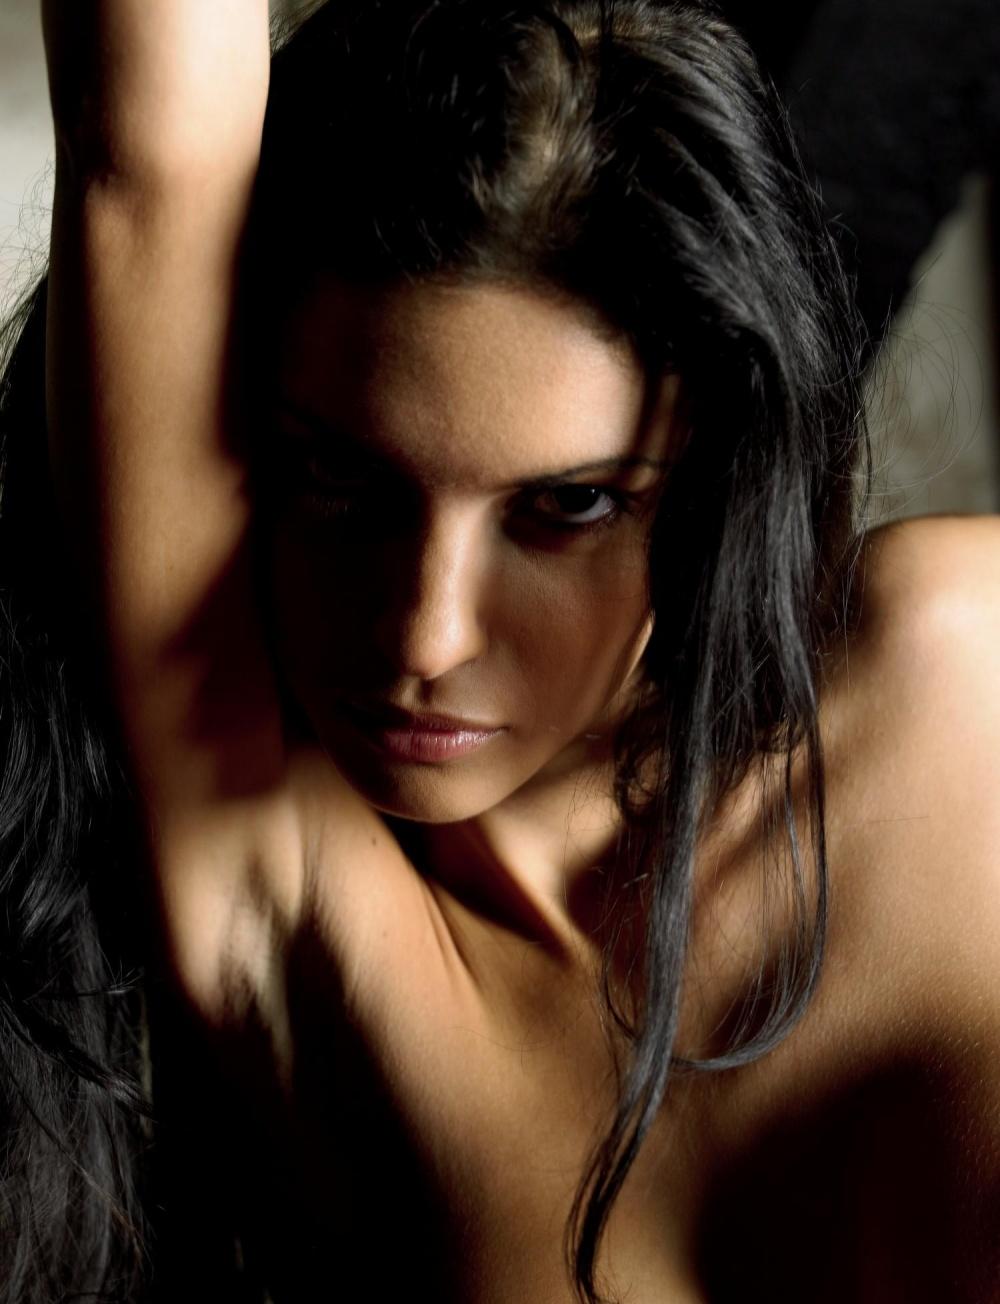 Sex prostitute karel seex helena movie sample